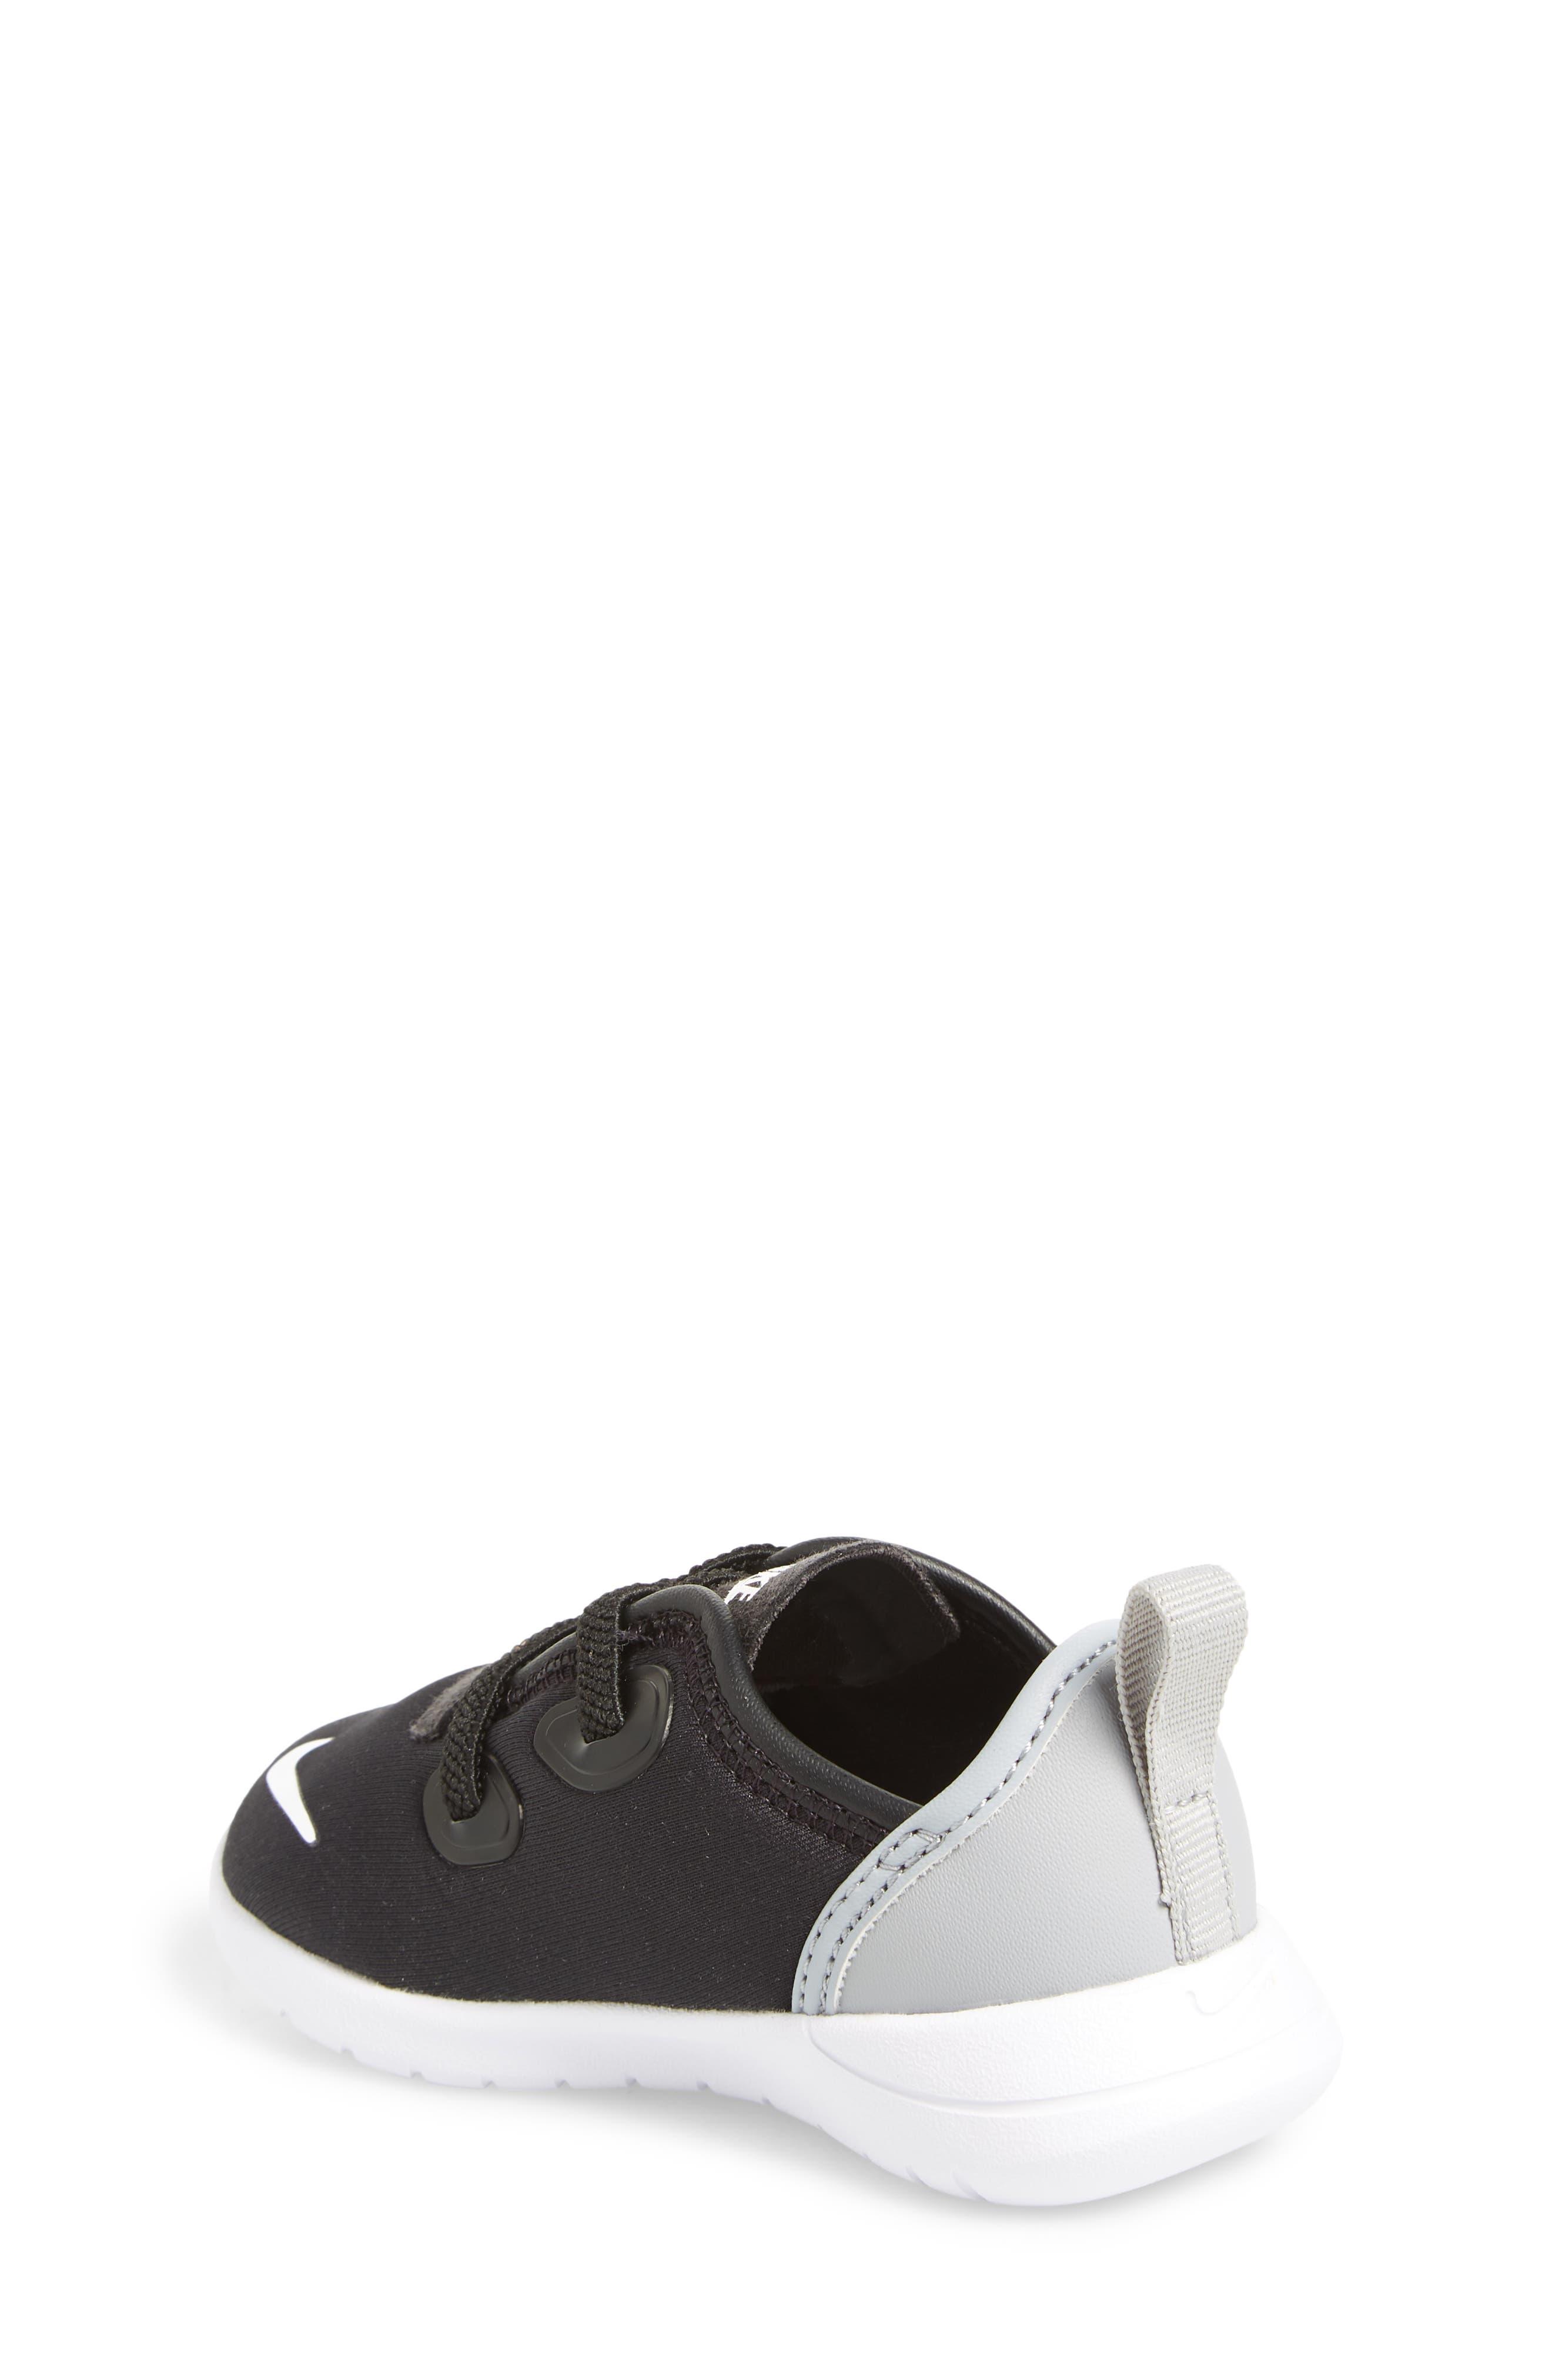 Hakata Sneaker,                             Alternate thumbnail 2, color,                             Black/ White/ Wolf Grey